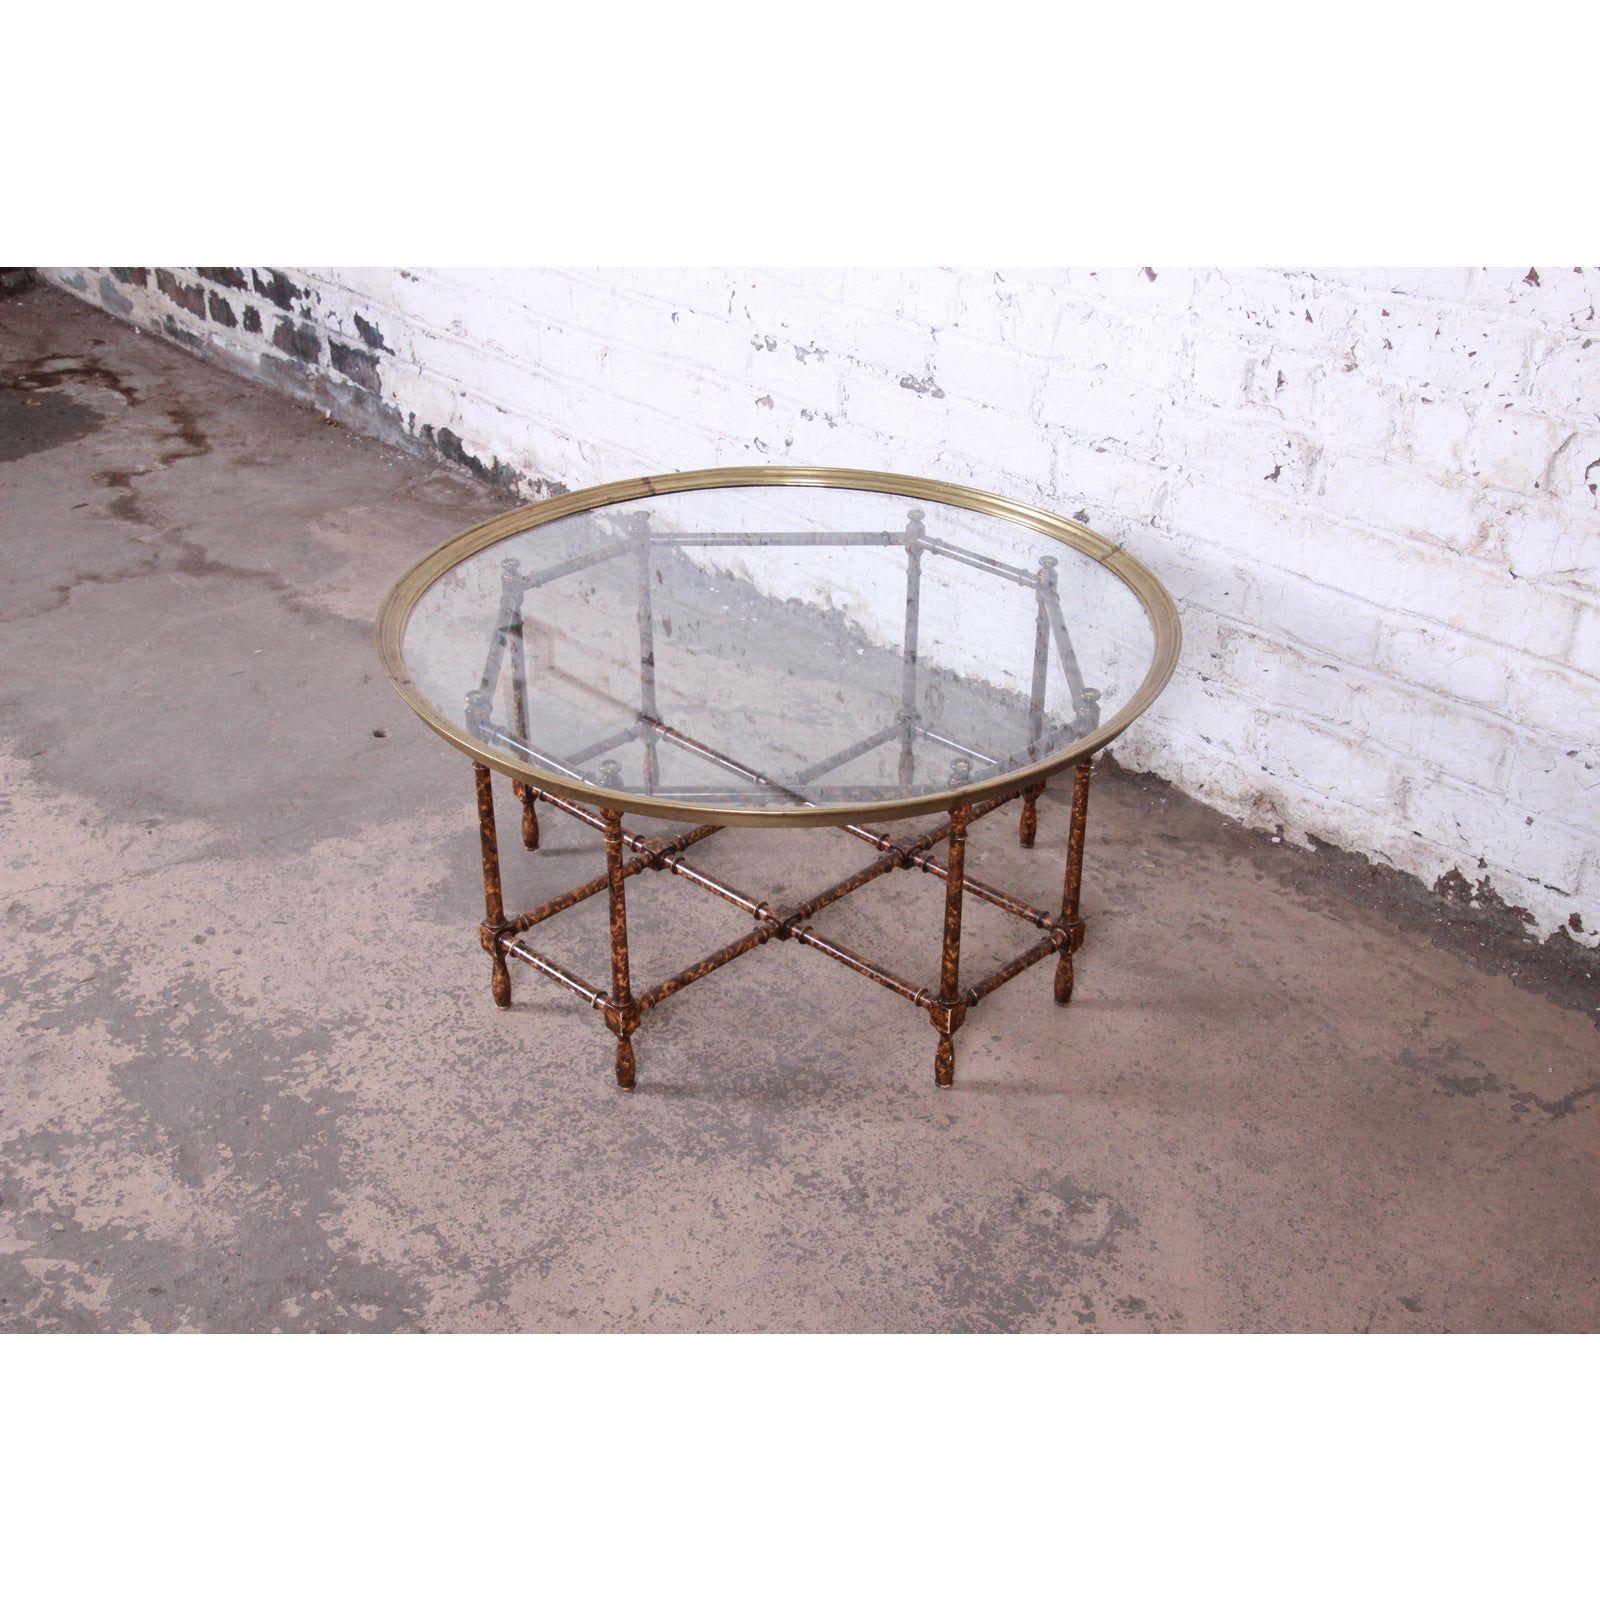 Paris Coffee Table By Thomas Pheasant 7898 Baker Furniture Coffee Table Brass Cocktail Table Brass Coffee Table [ 924 x 1556 Pixel ]